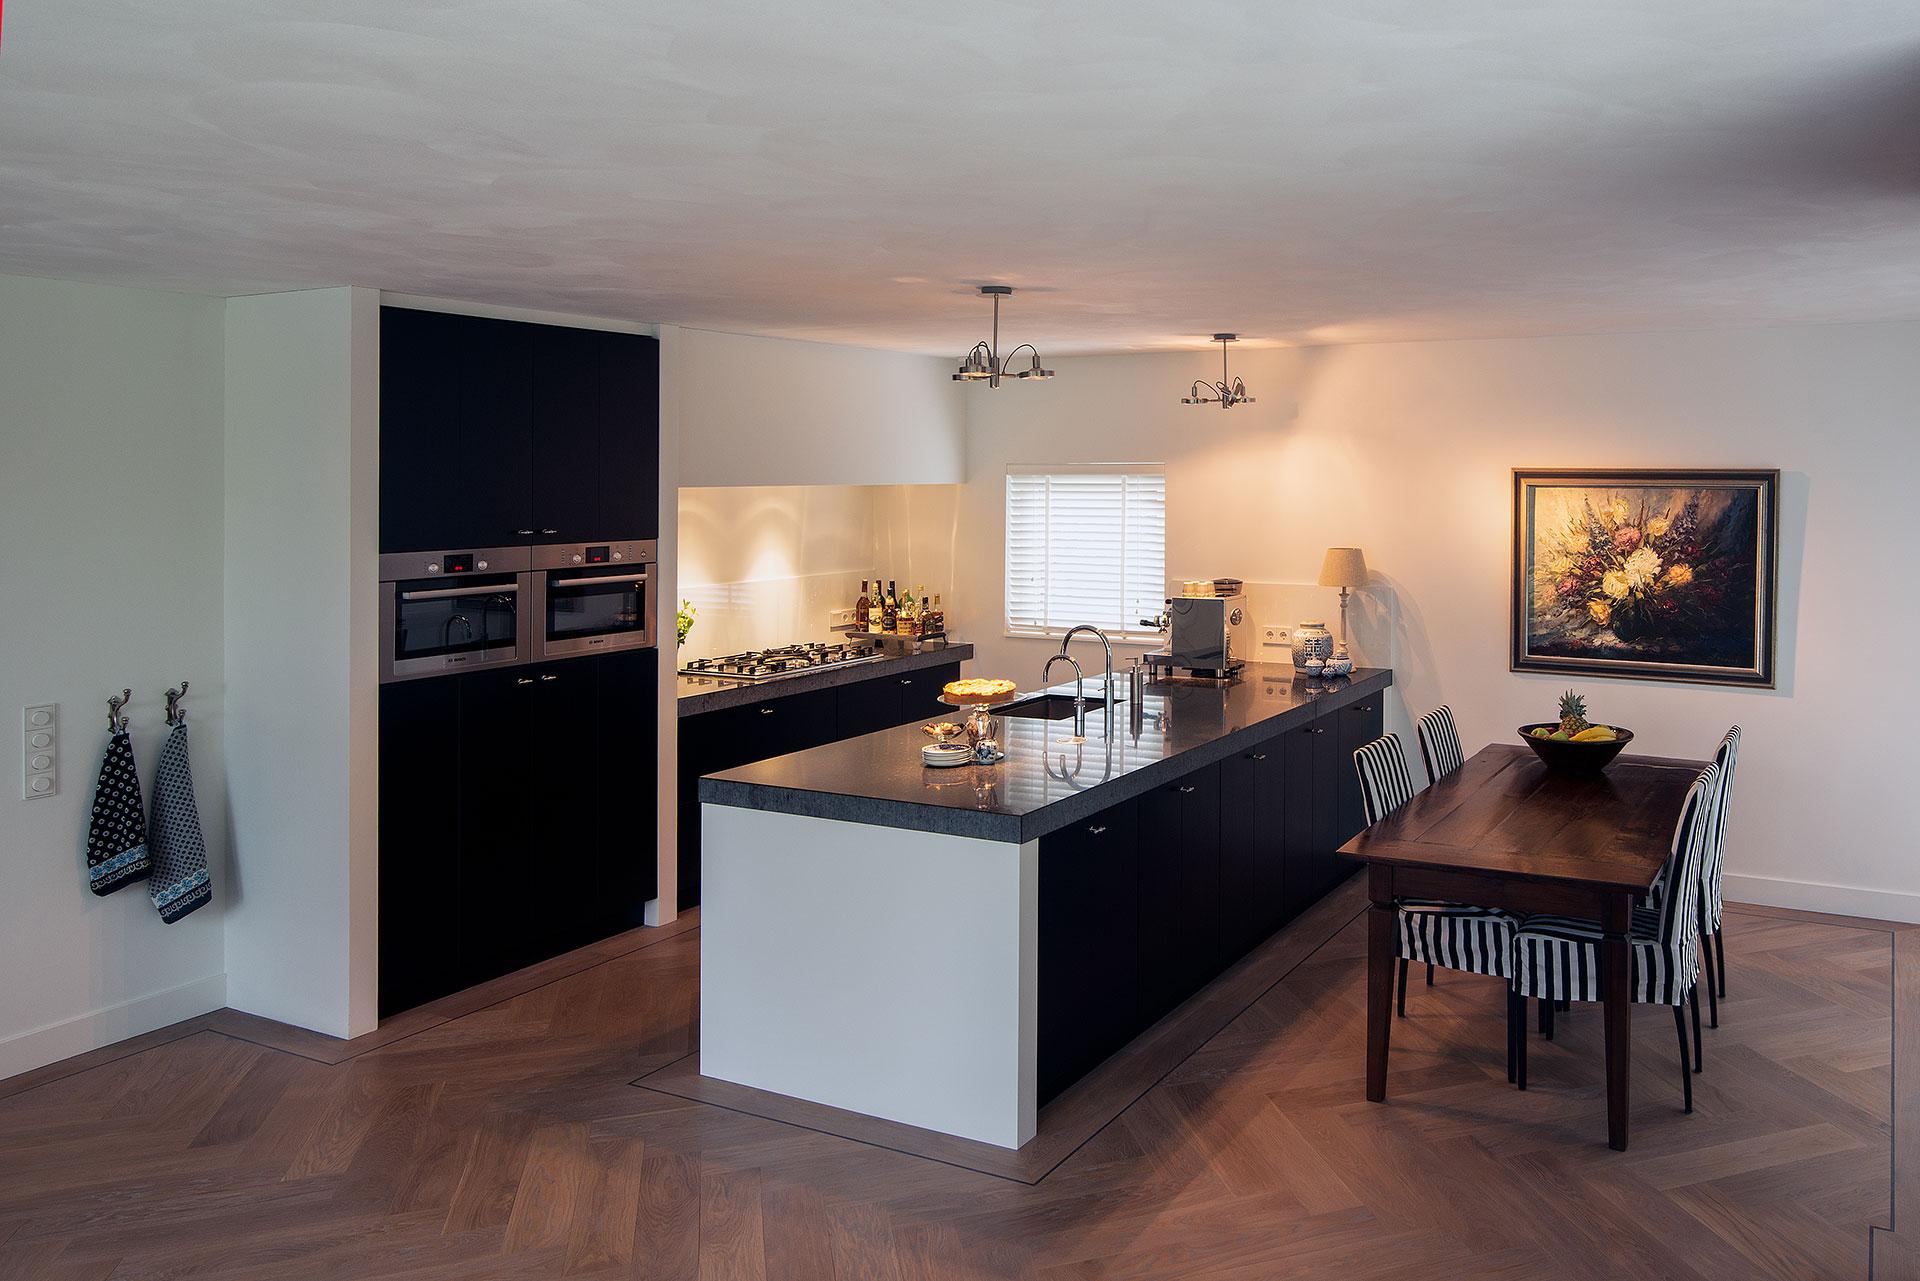 Visgraat Vloer Keuken : Eiken visgraat in keuken